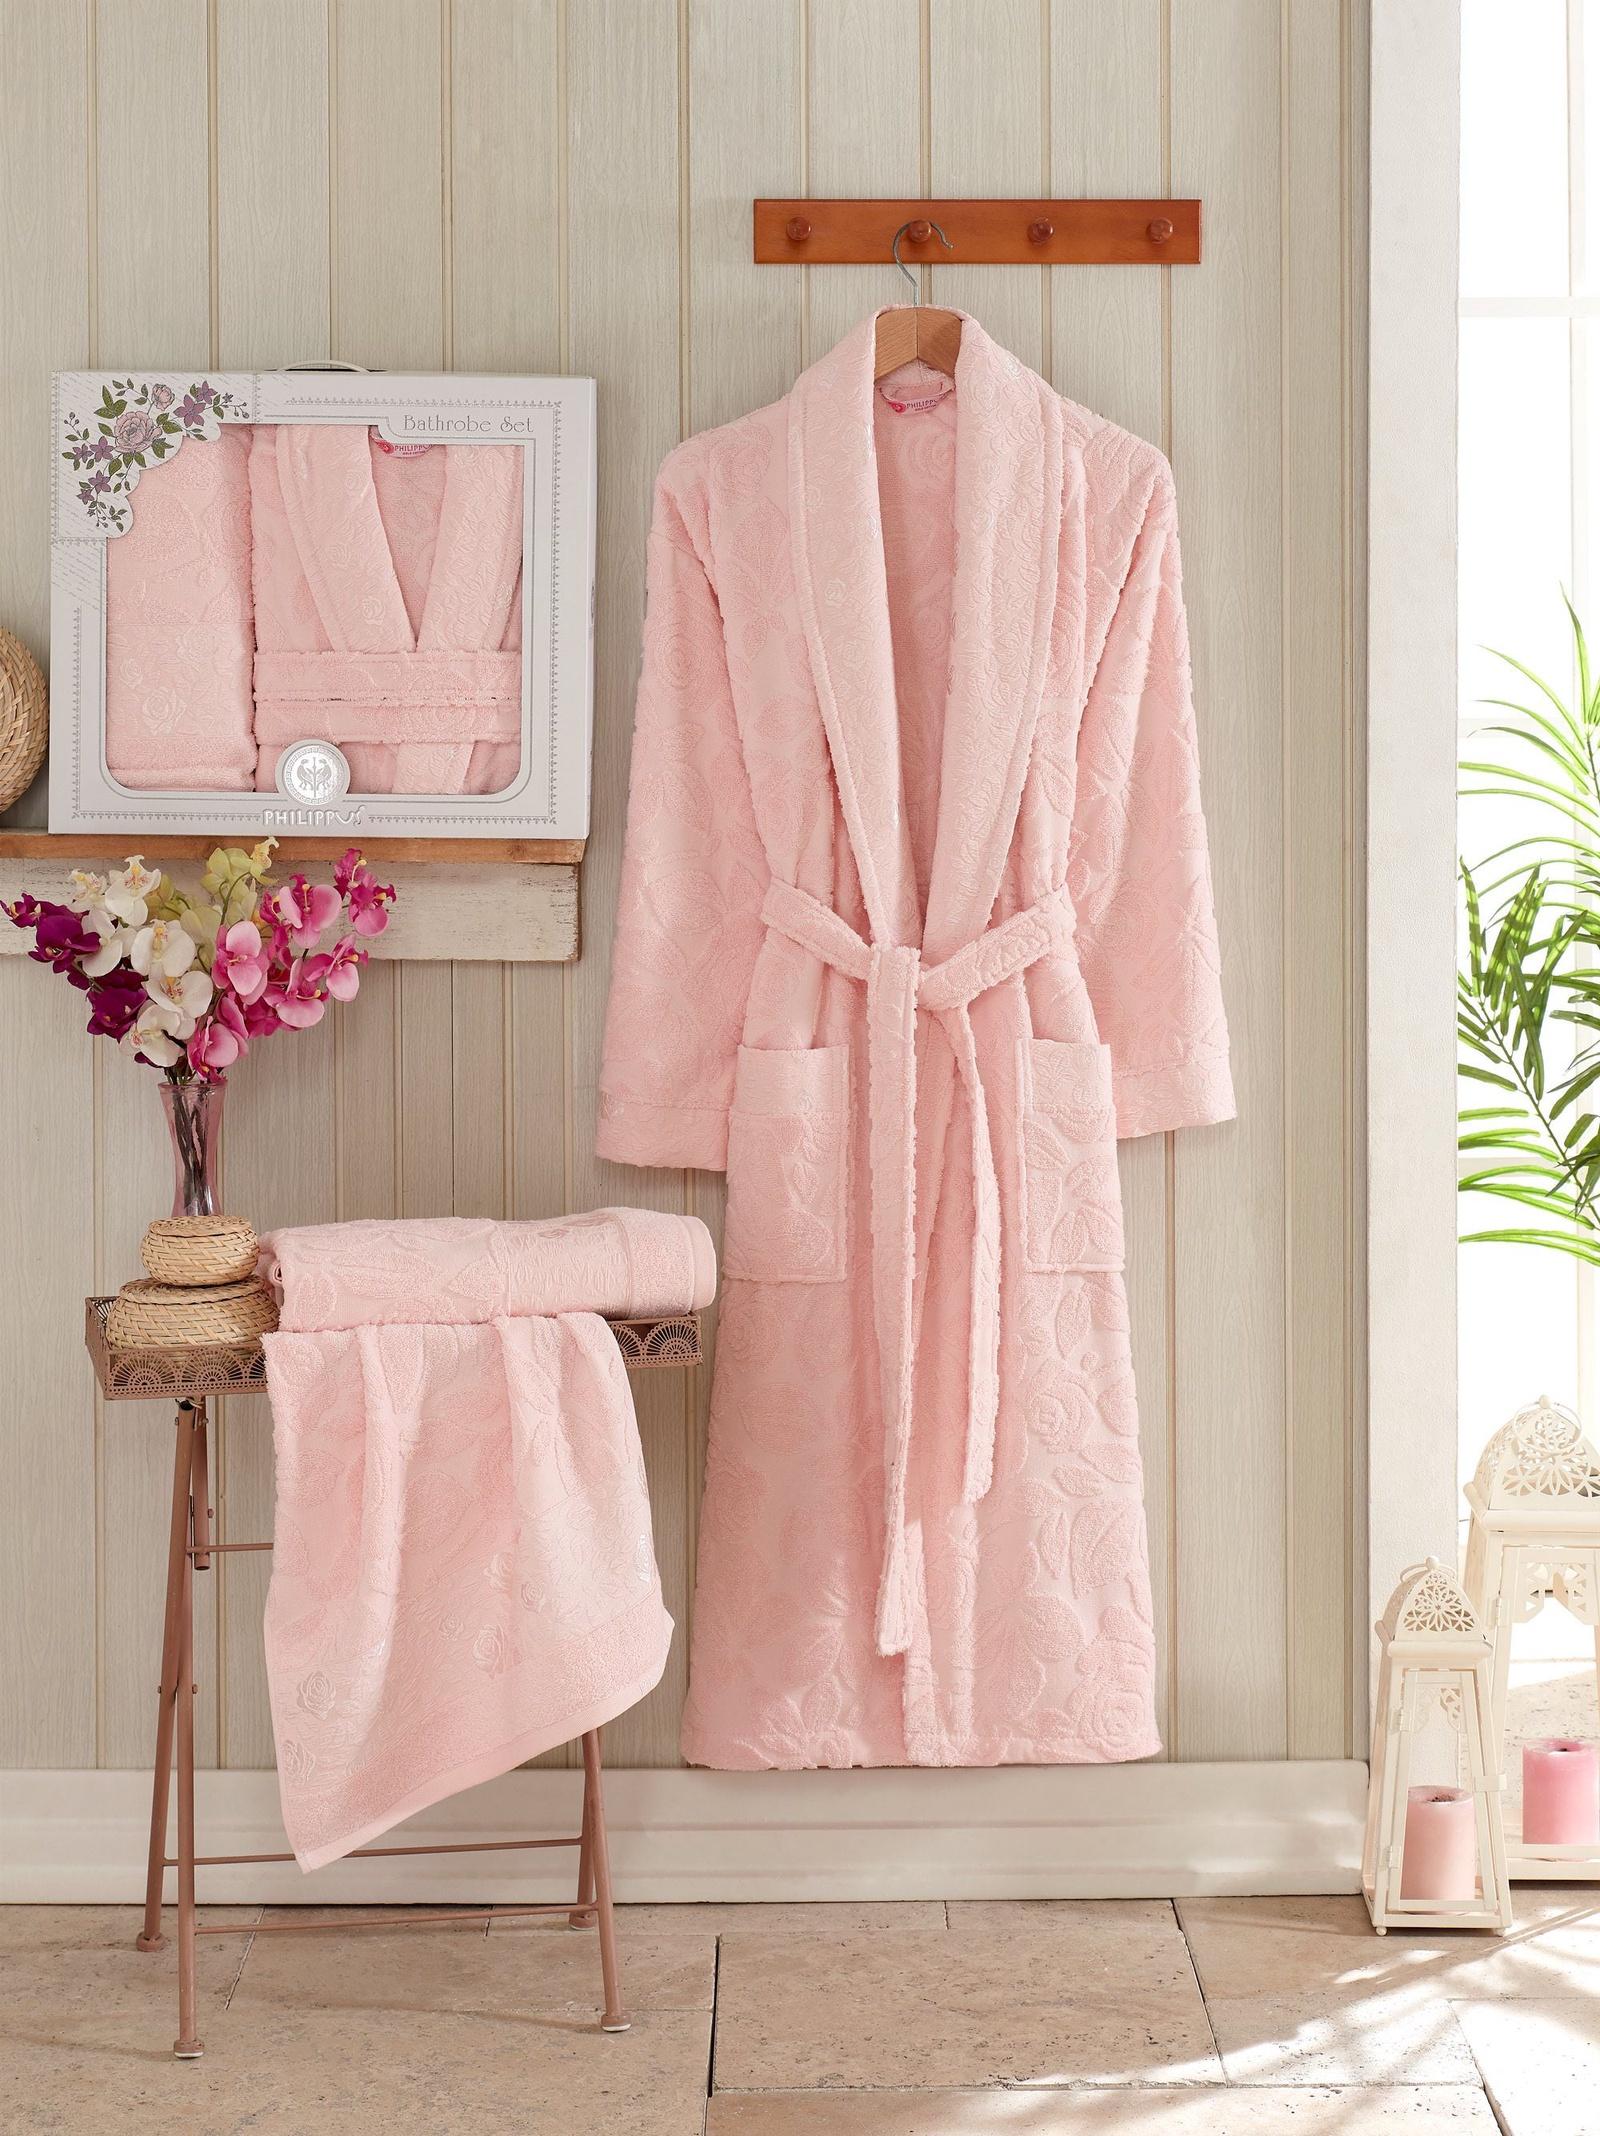 Фото - Полотенце-халат PHILIPPUS халаты и пижамы